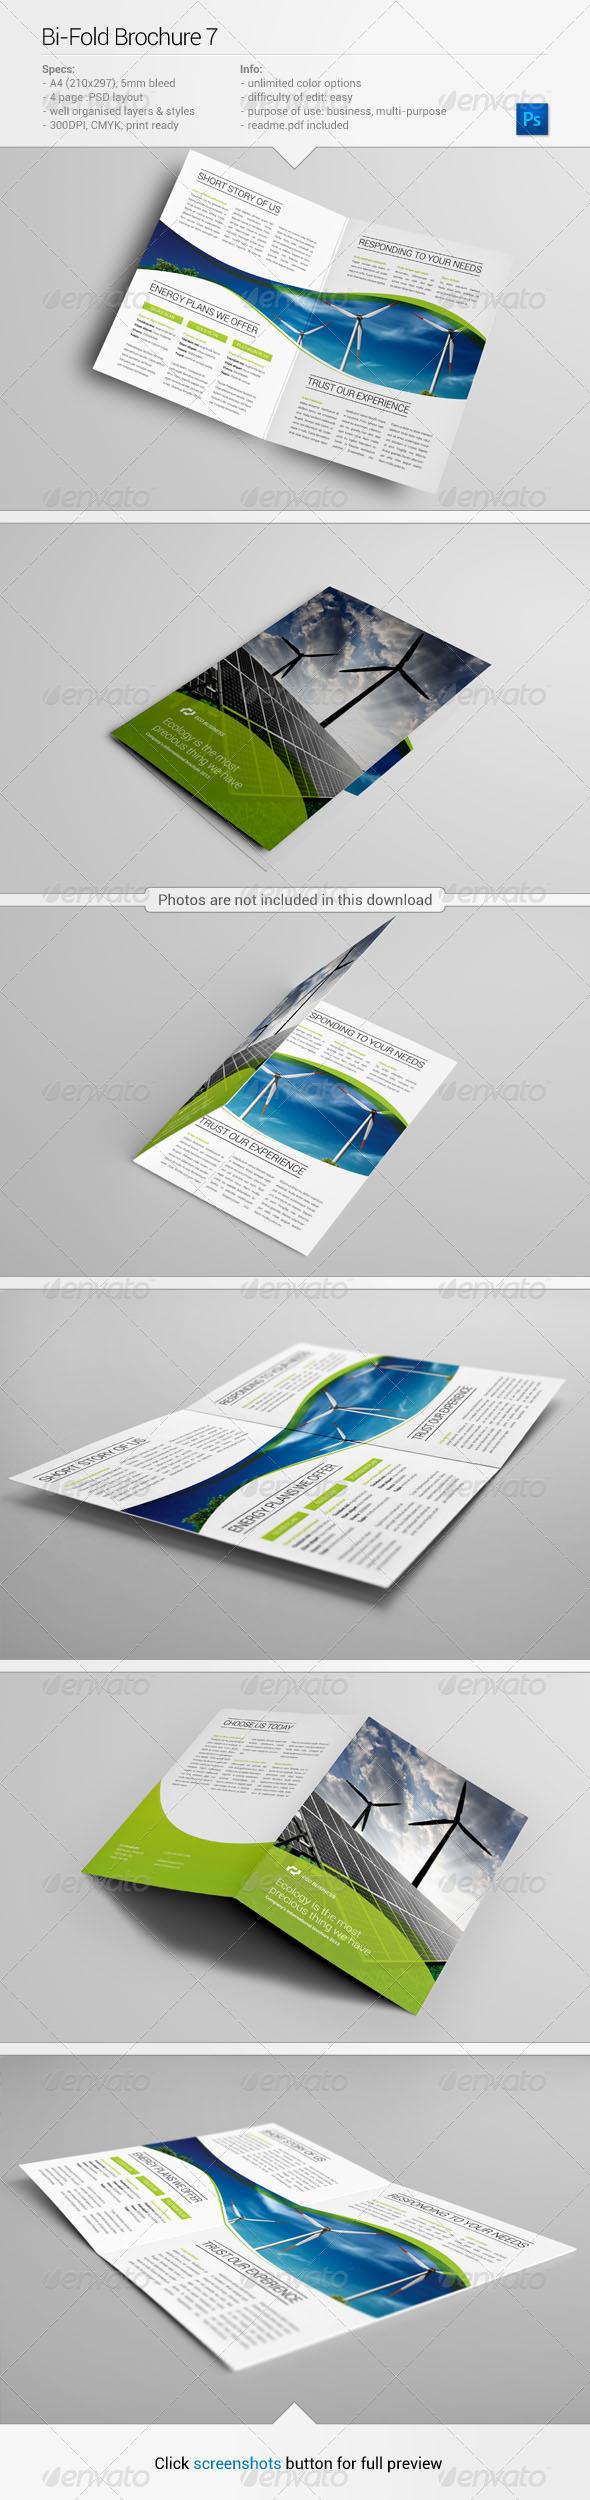 Bi-Fold Brochure 7 - Corporate Brochures